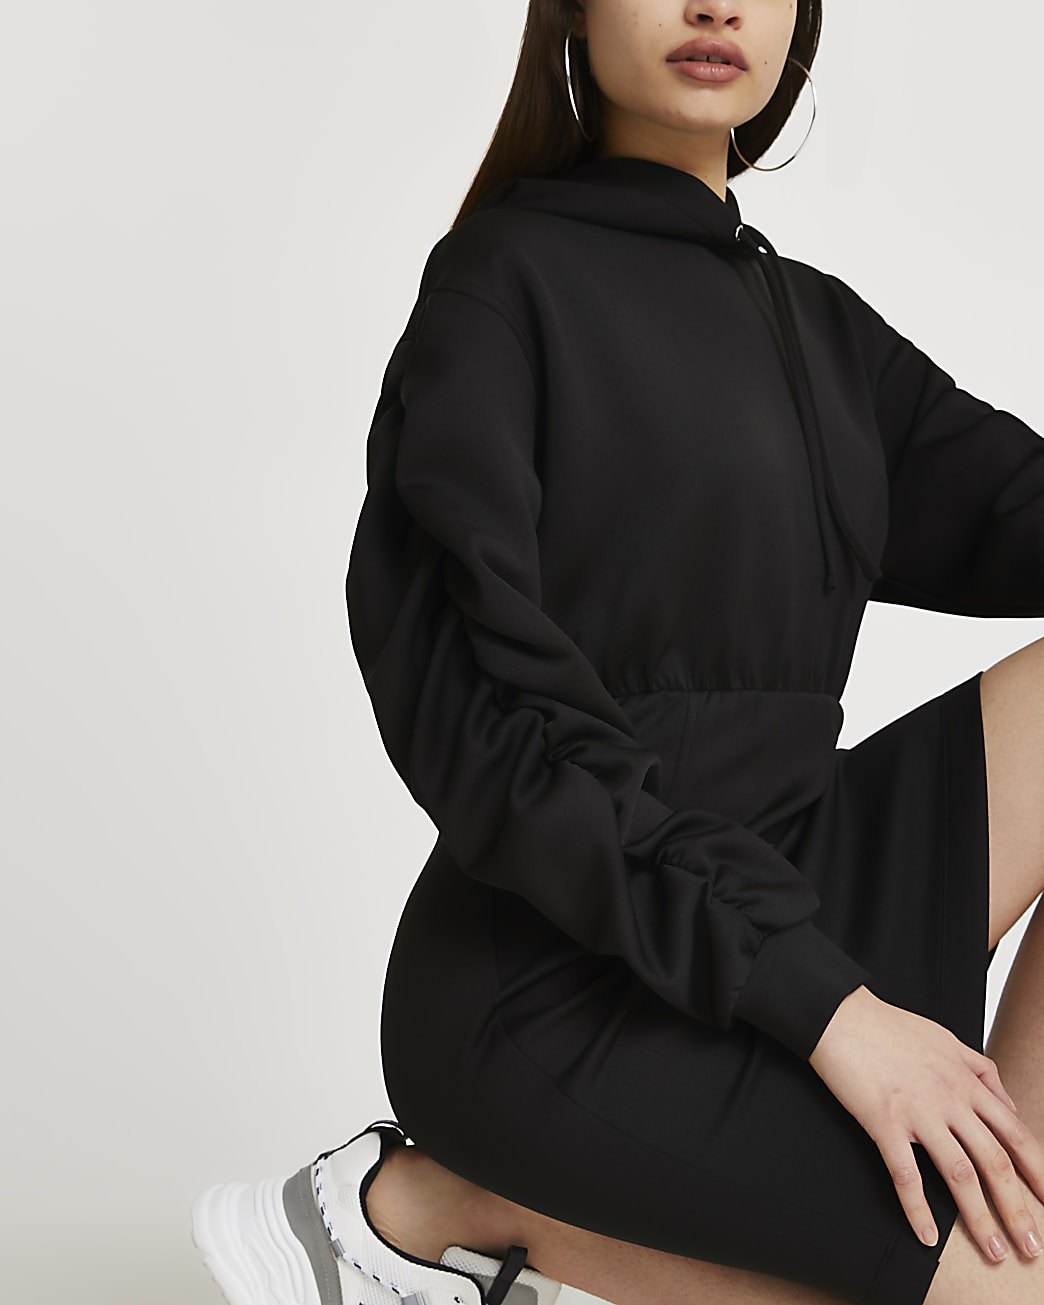 Black hooded bodycon dress